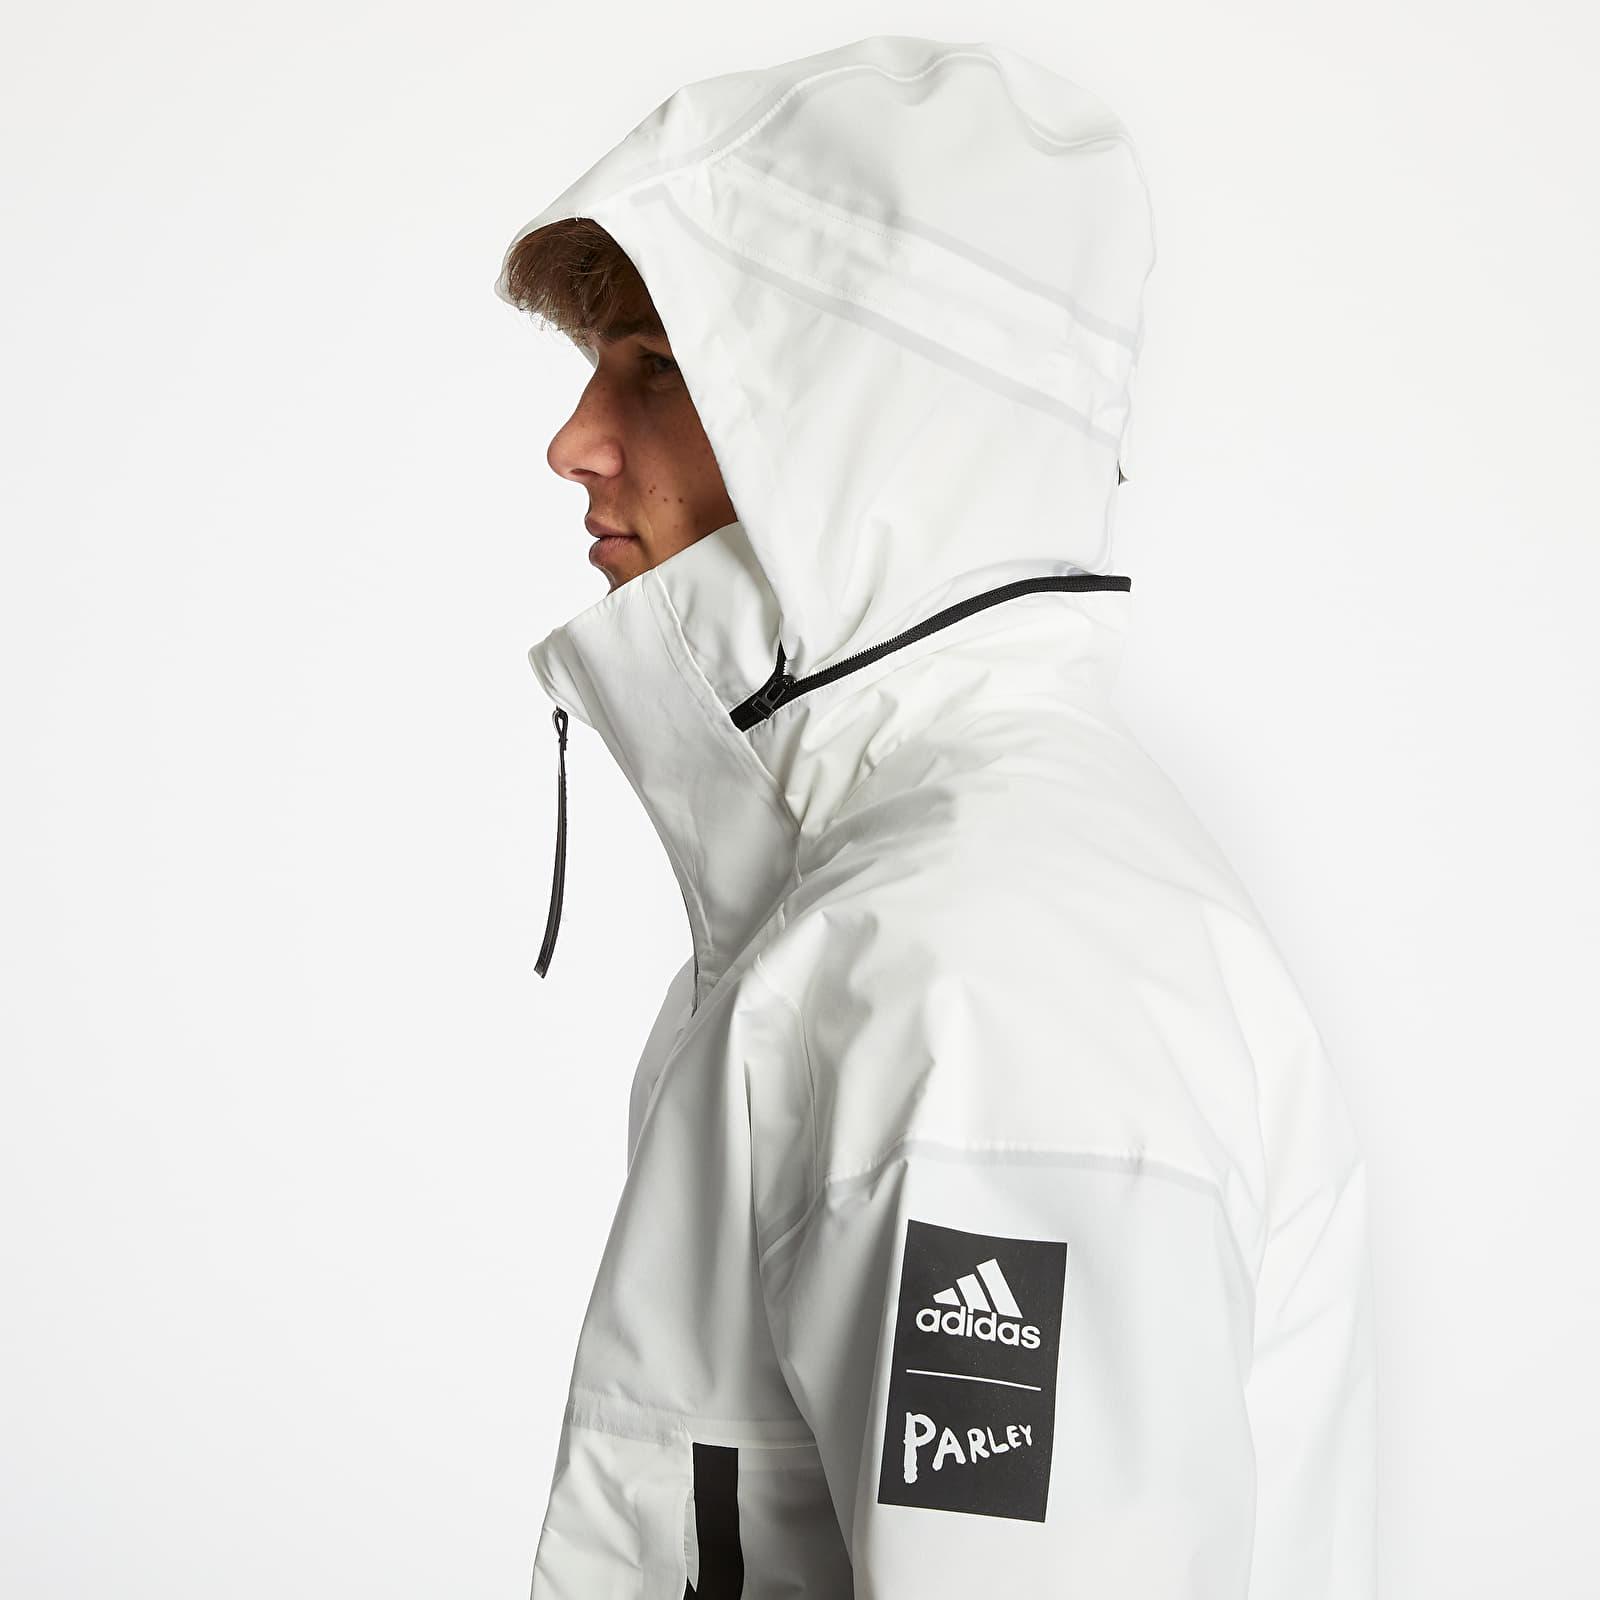 Coach Jackets adidas x Parley Myshelter Parka Non Dye